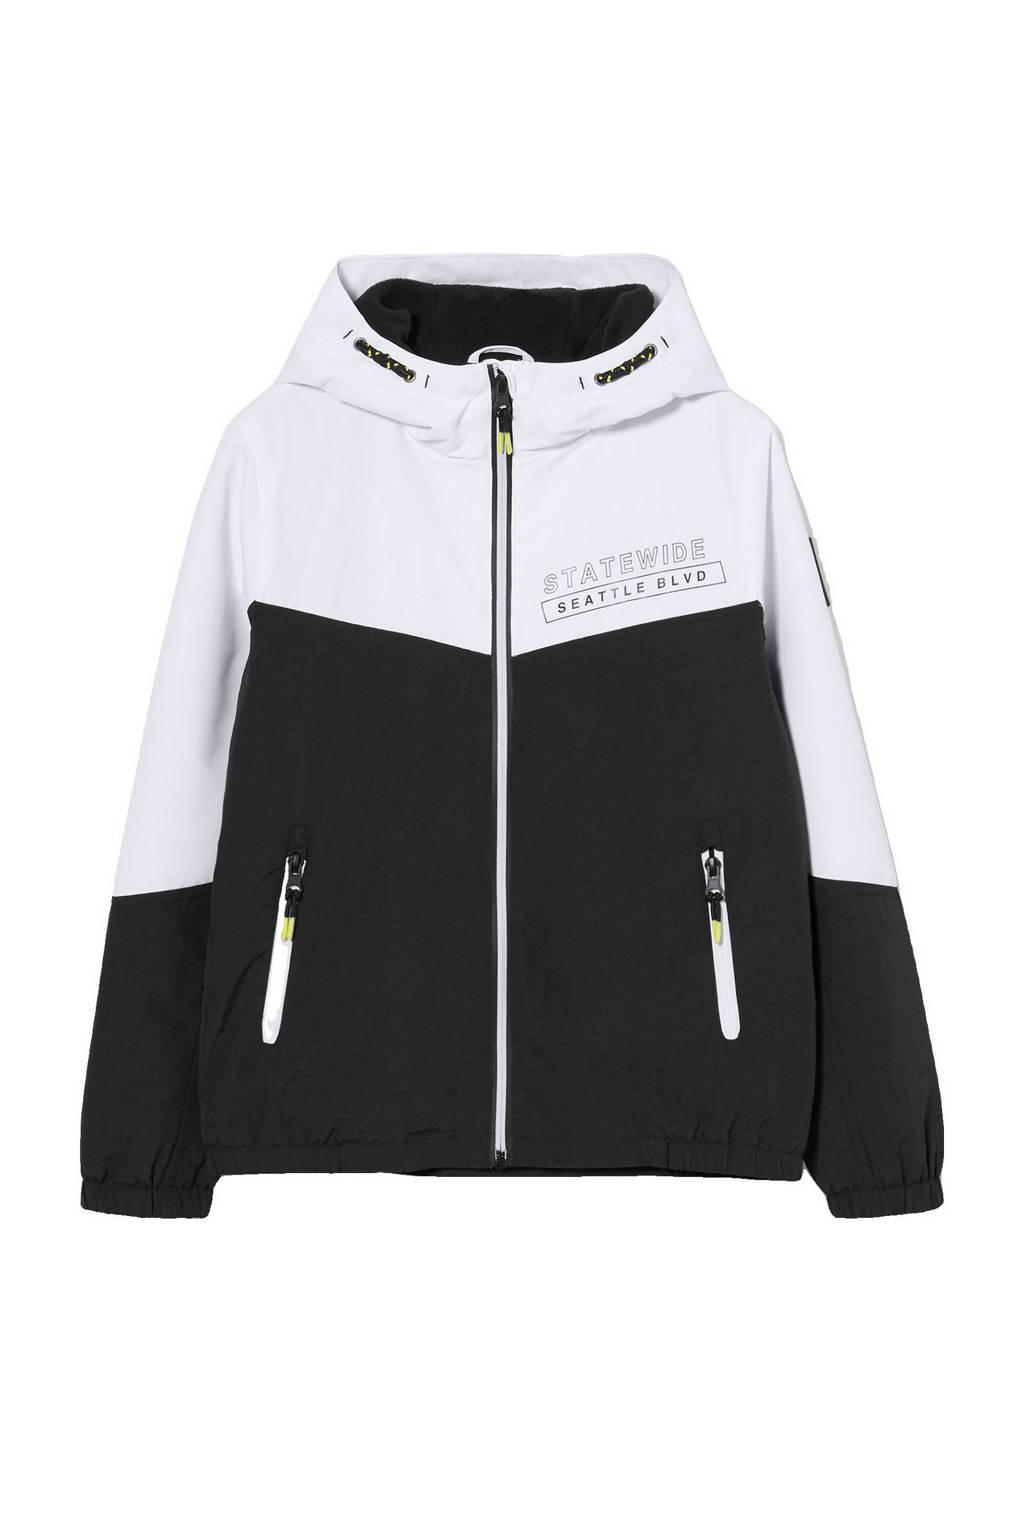 C&A Here & There  zomerjas wit/zwart, Wit/zwart